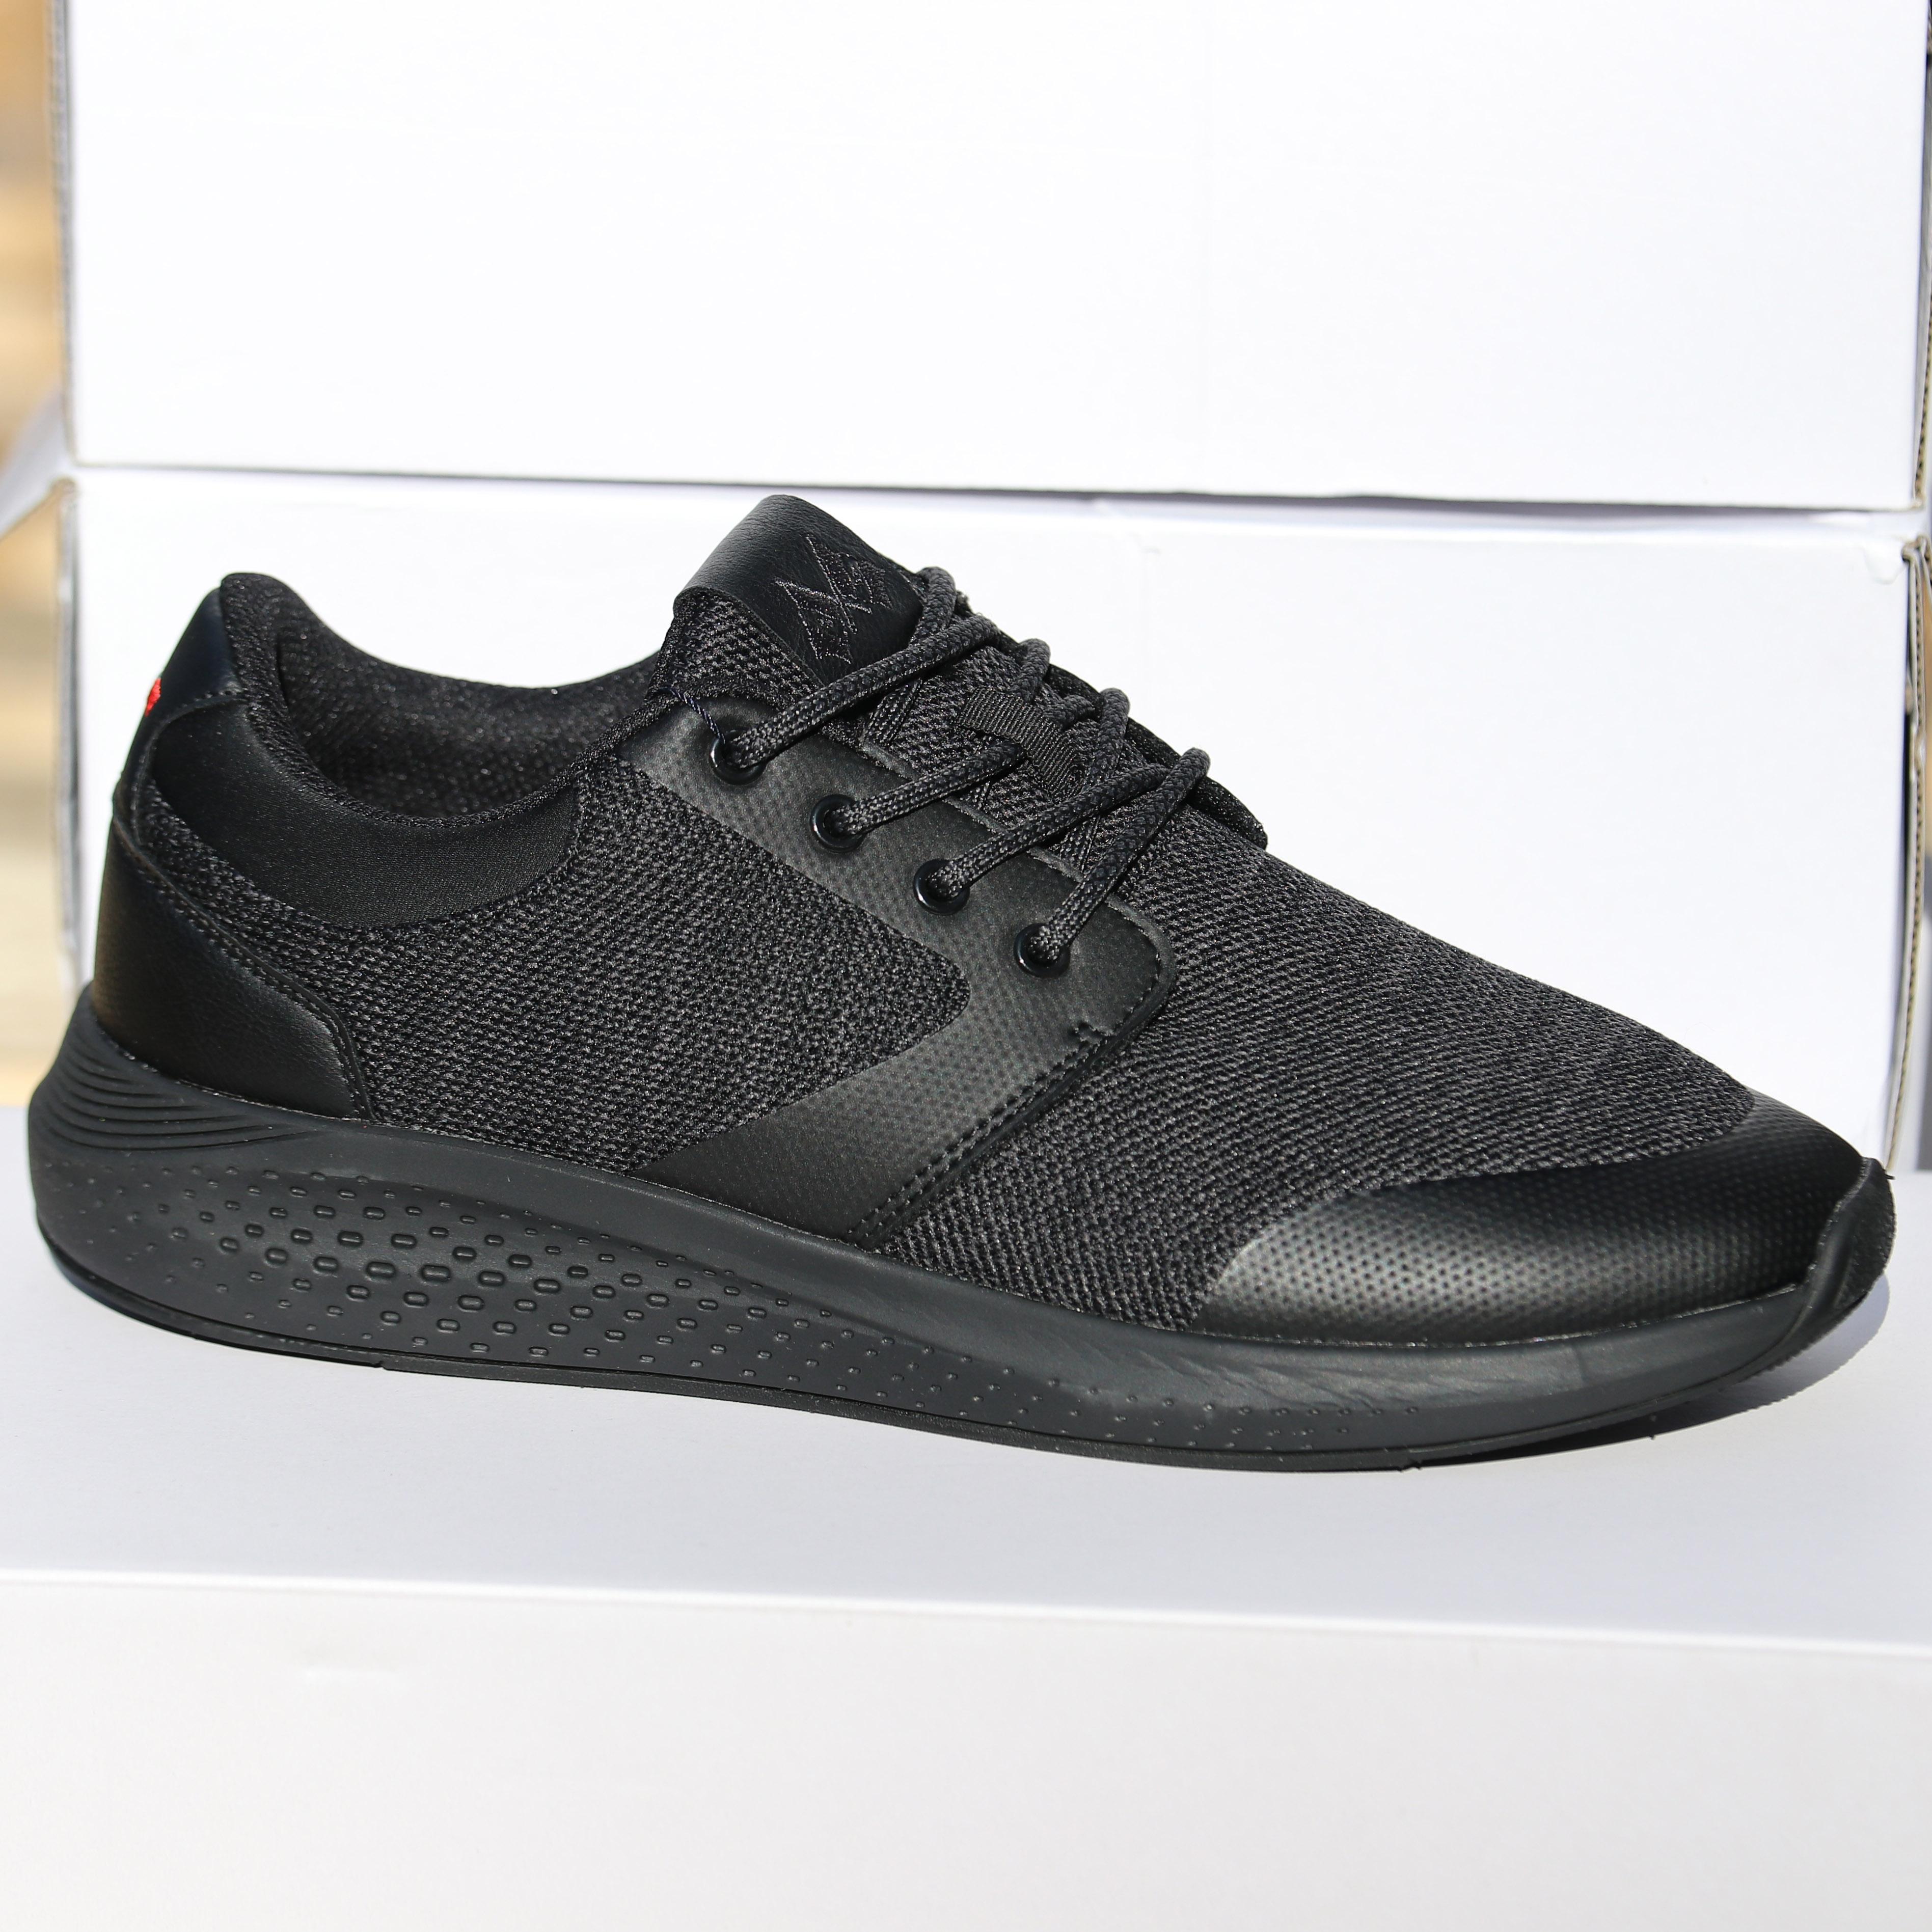 jean paul – borgloon black sko herre4